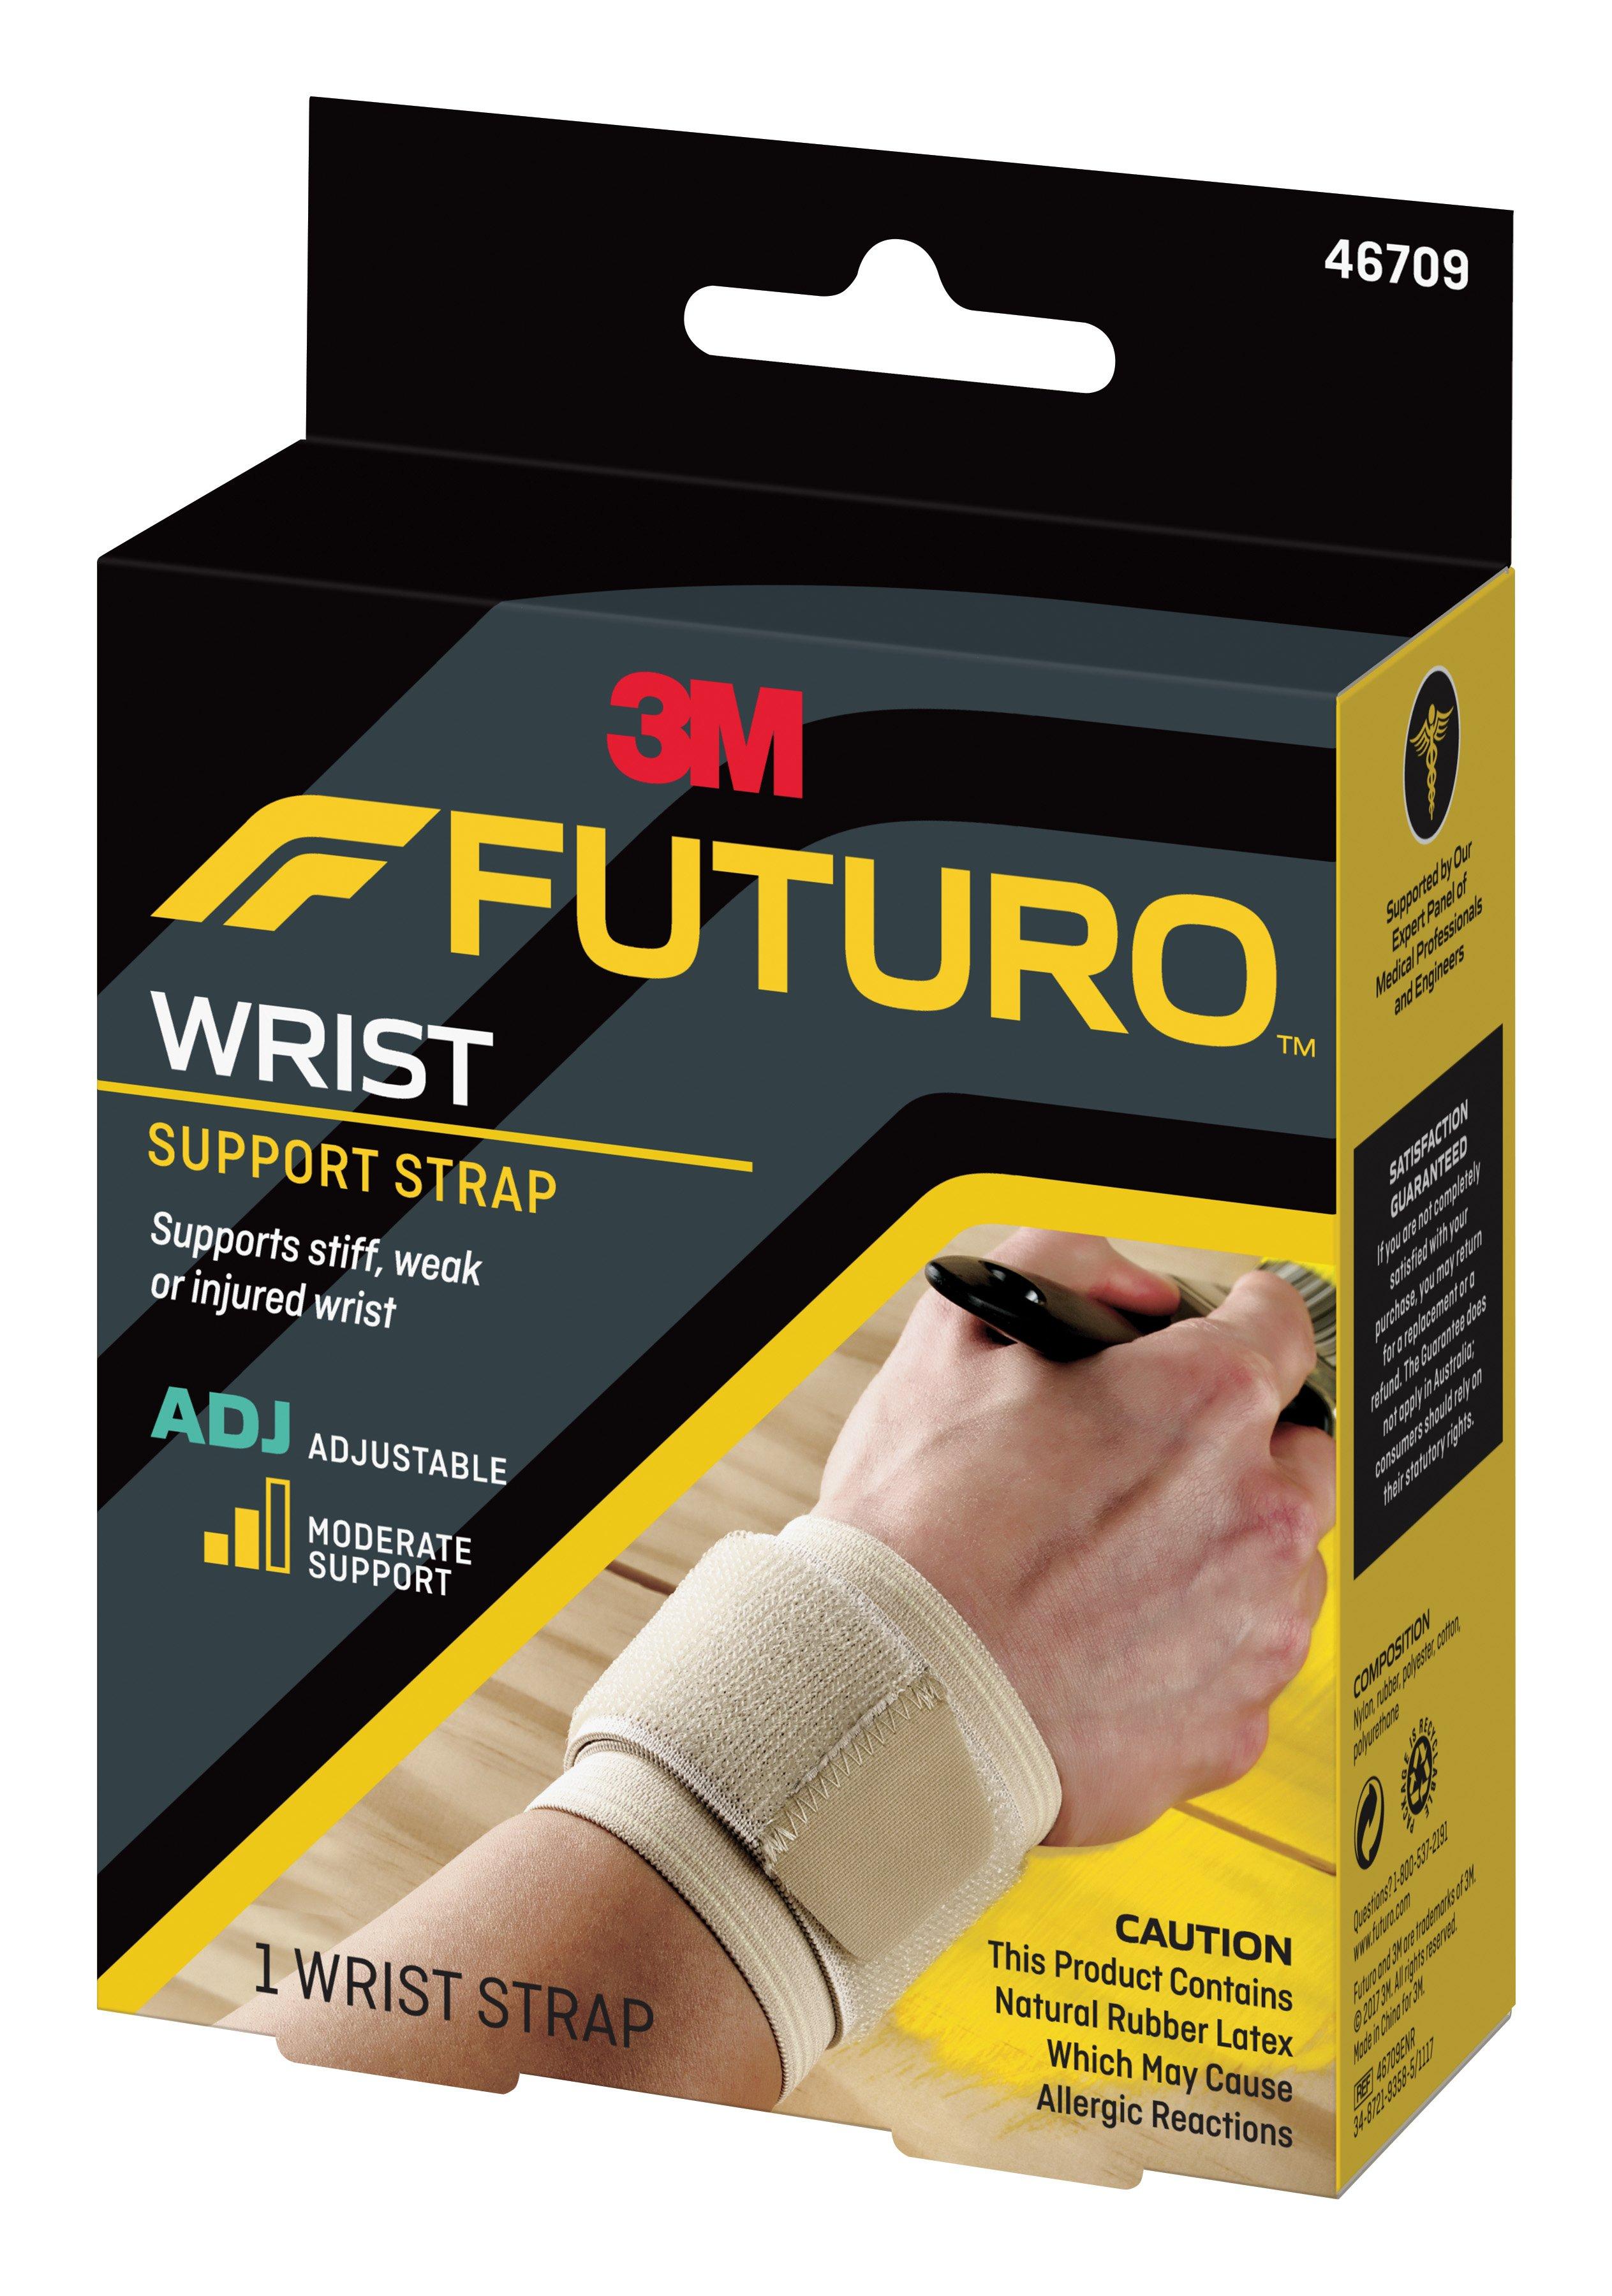 FUTURO WRAP AROUND WRIST SUPPORT